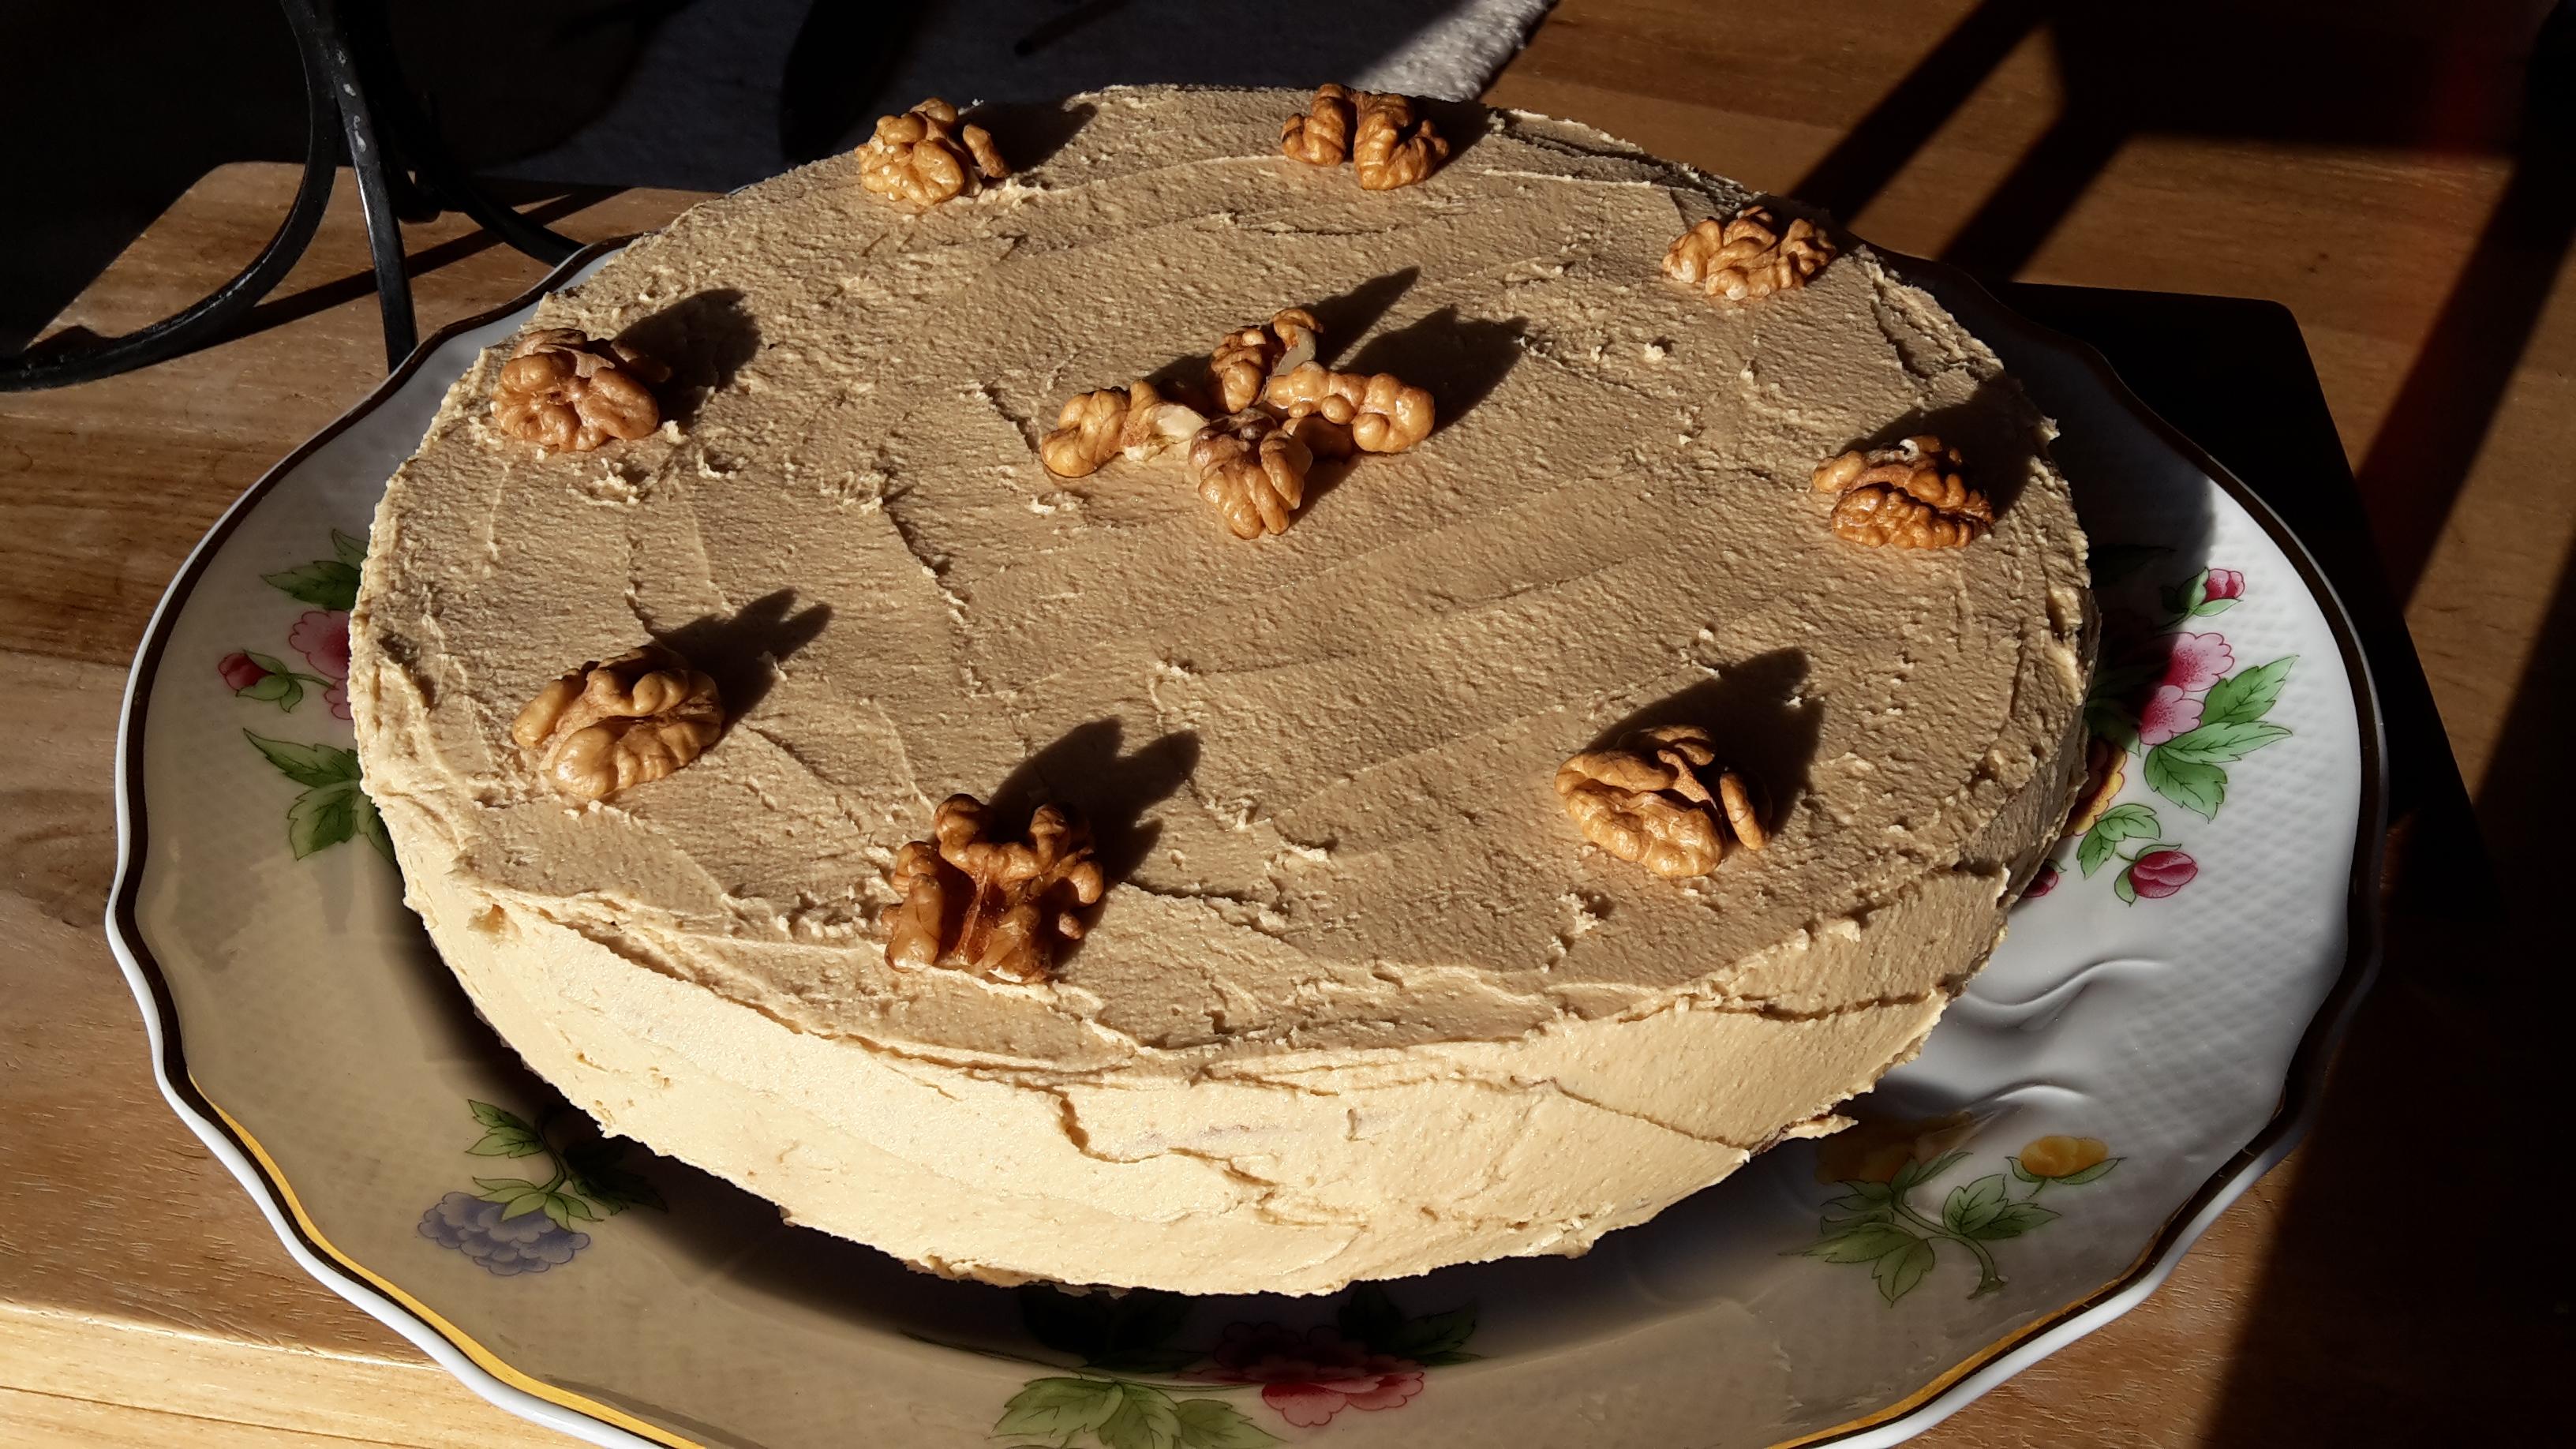 Kaffee-Walnuss-Torte